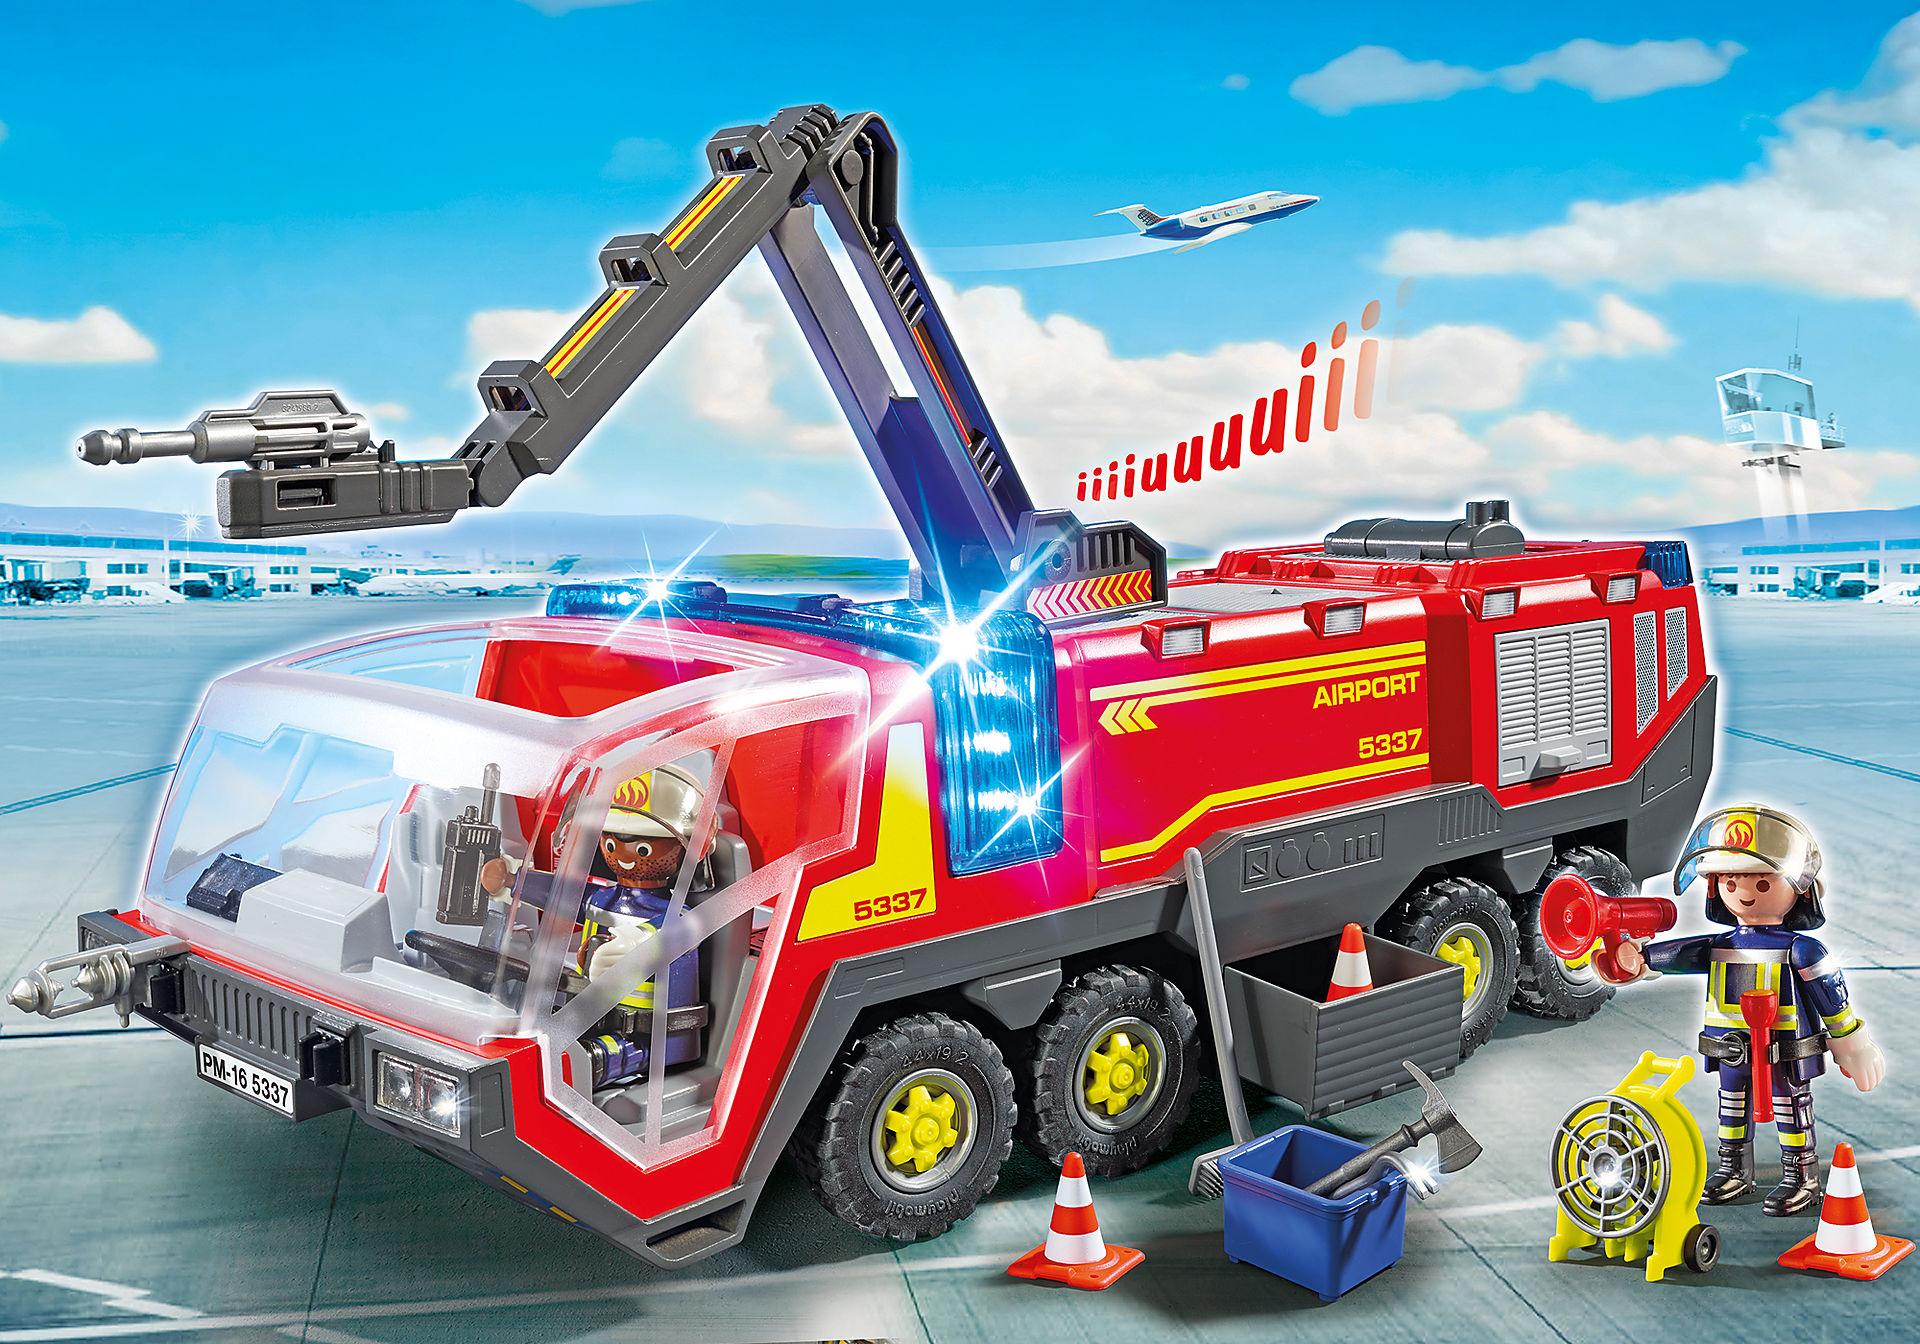 5337 Lufthavnsbrandbil med lys og lyd zoom image1